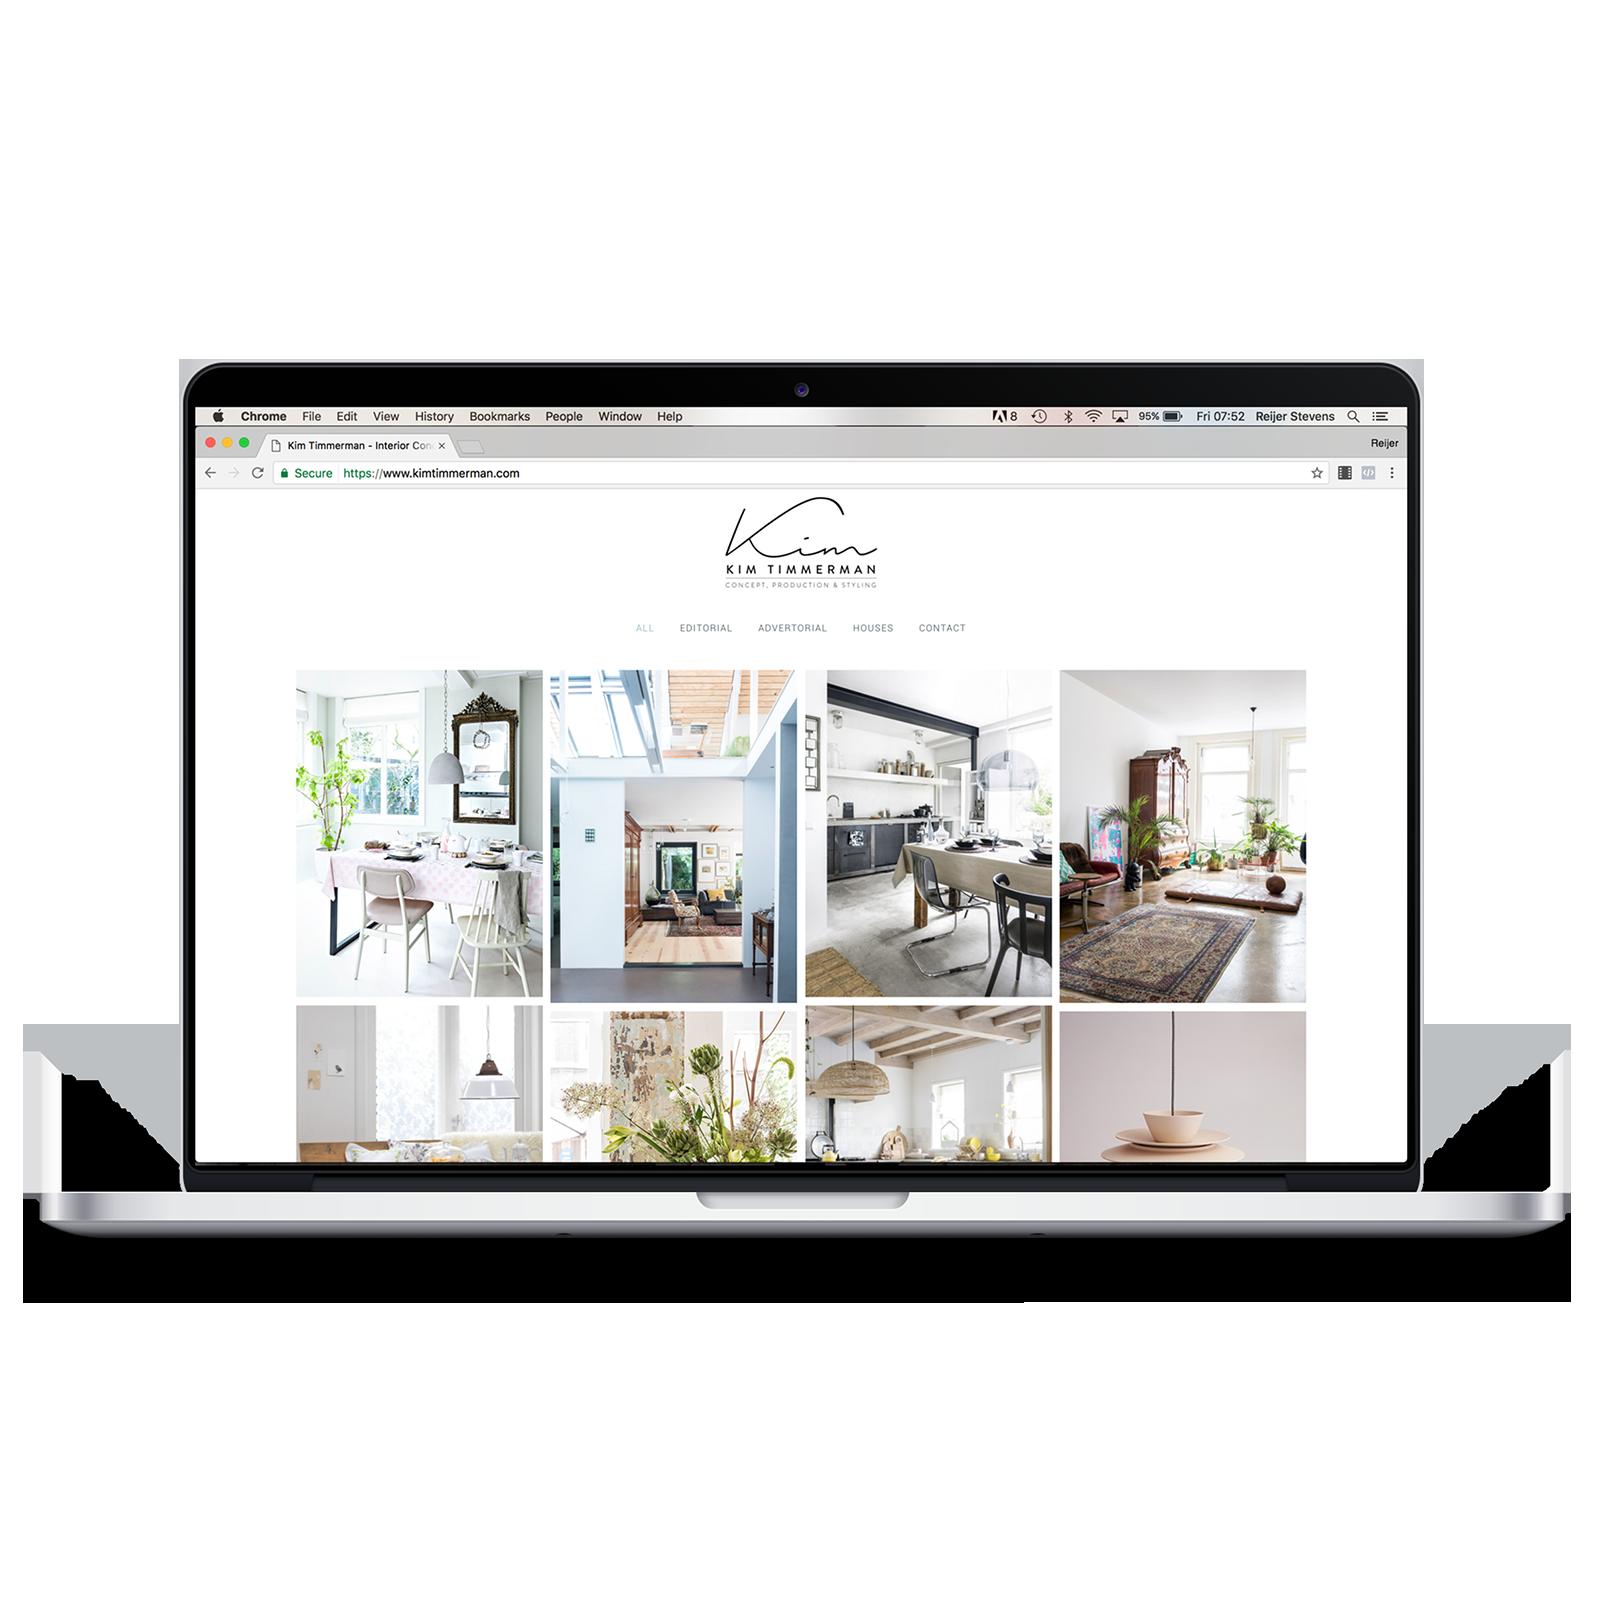 Portfolio website Kim Timmerman - Reijer Stevens webdesign Amsterdam